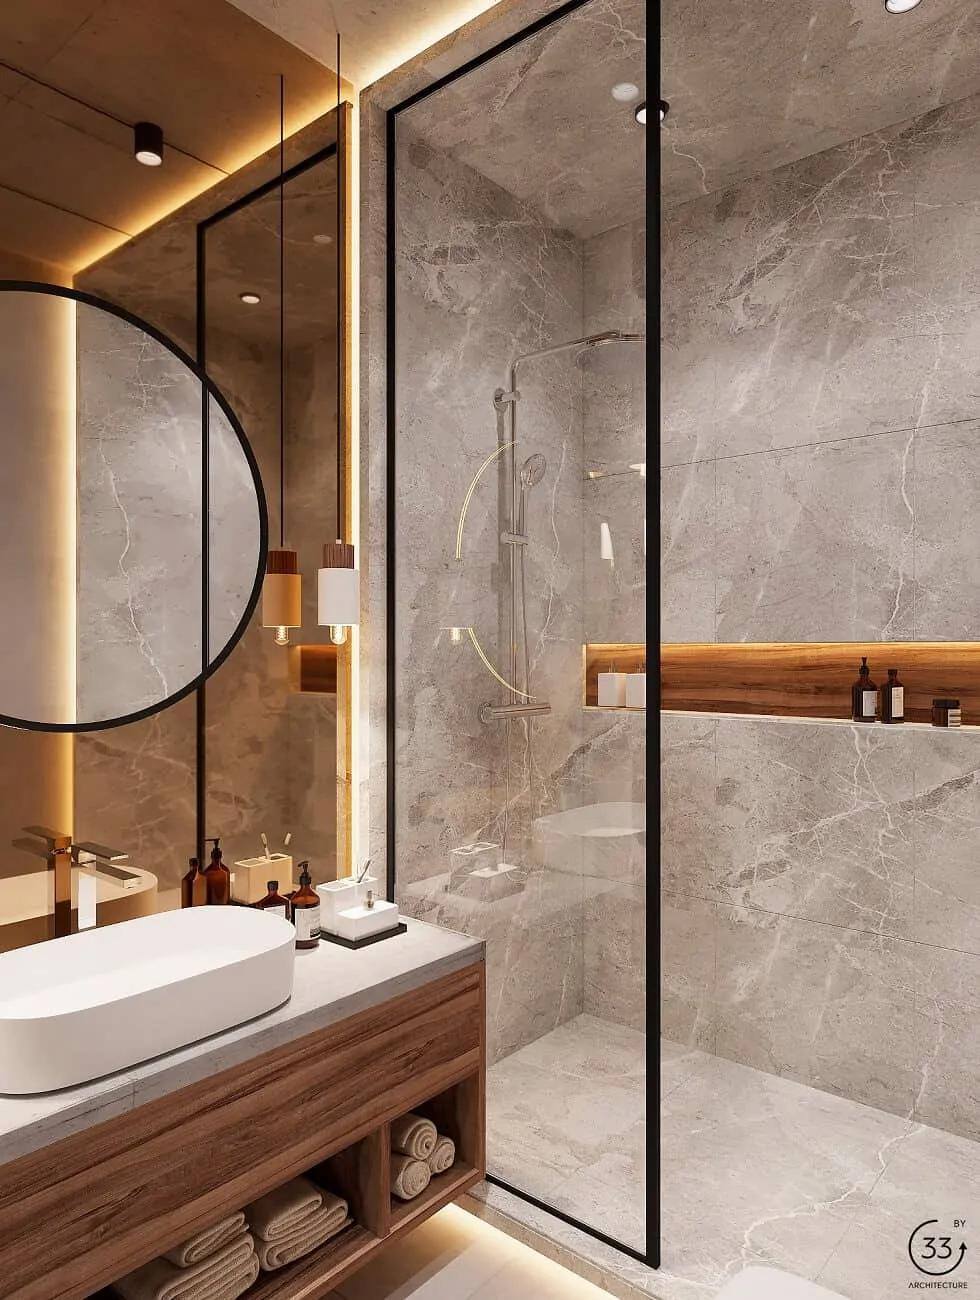 39 Stunning Modern Shower Ideas You Need To Consider Bathroom Decor Luxury Bathroom Design Decor Diy Bathroom Decor